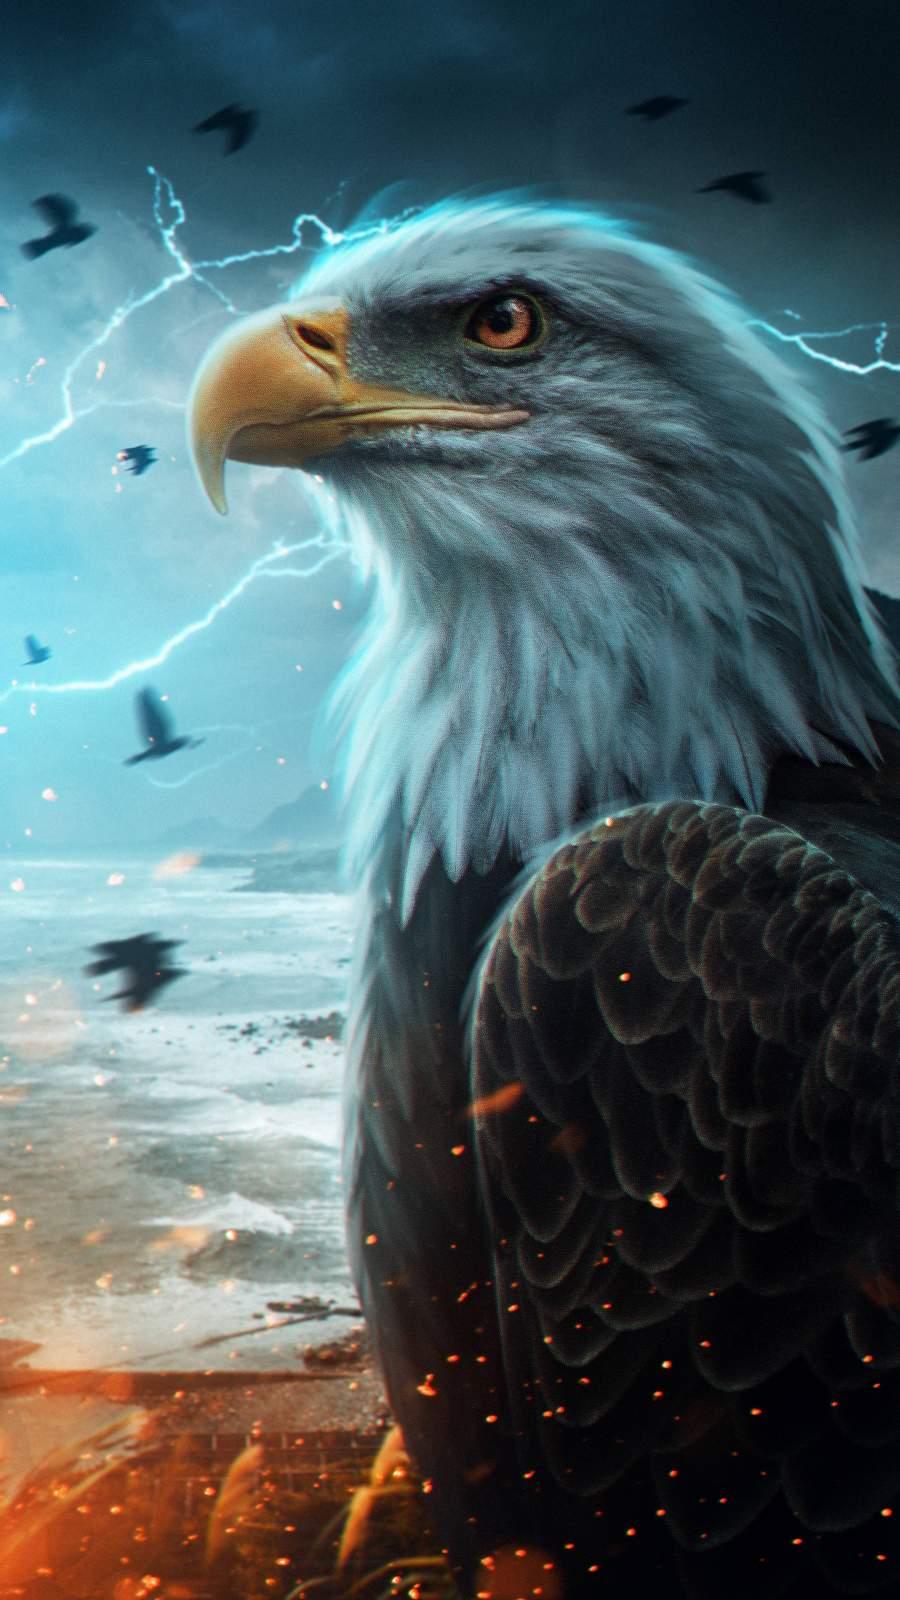 The Predator Eagle iPhone Wallpaper